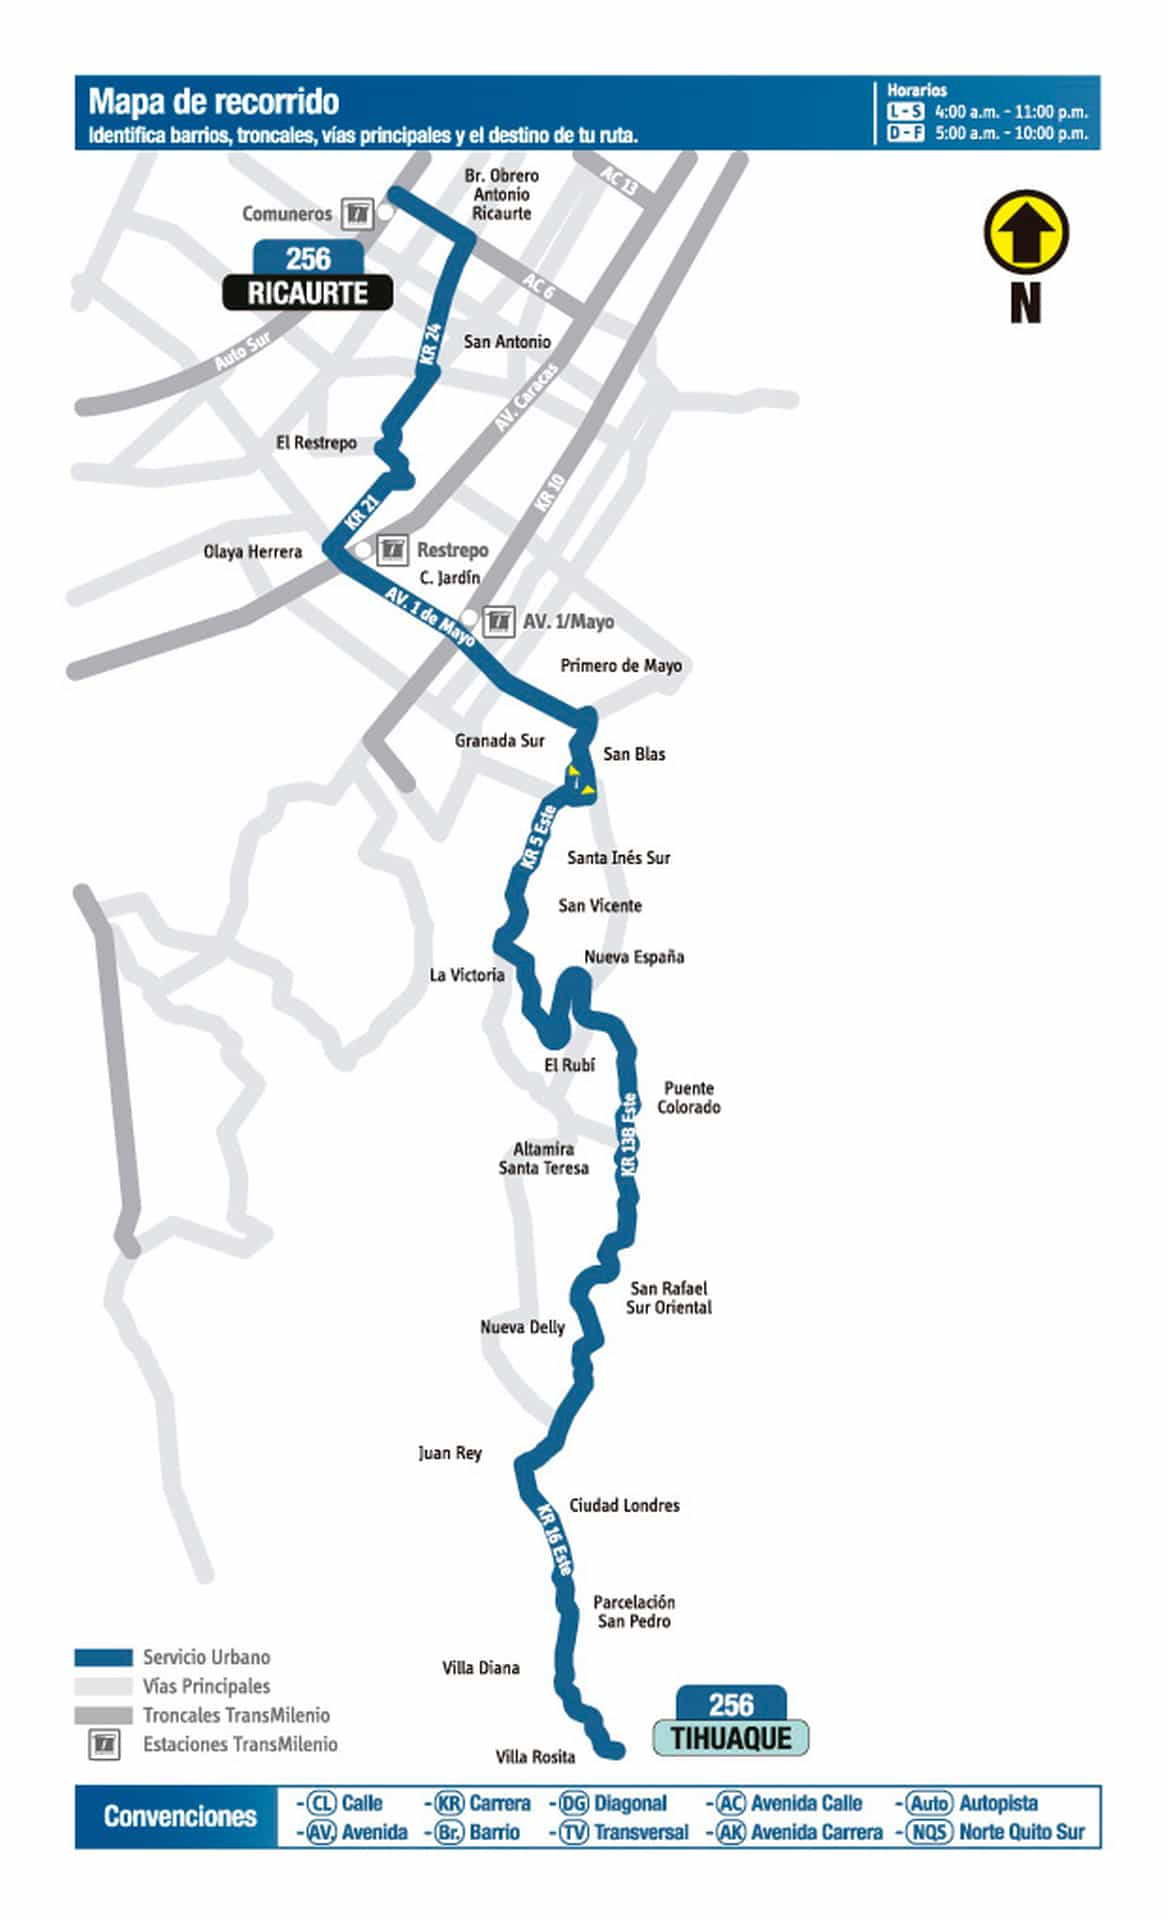 Ruta bus SITP: 256 Tihuaque - Ricaurte (mapa)